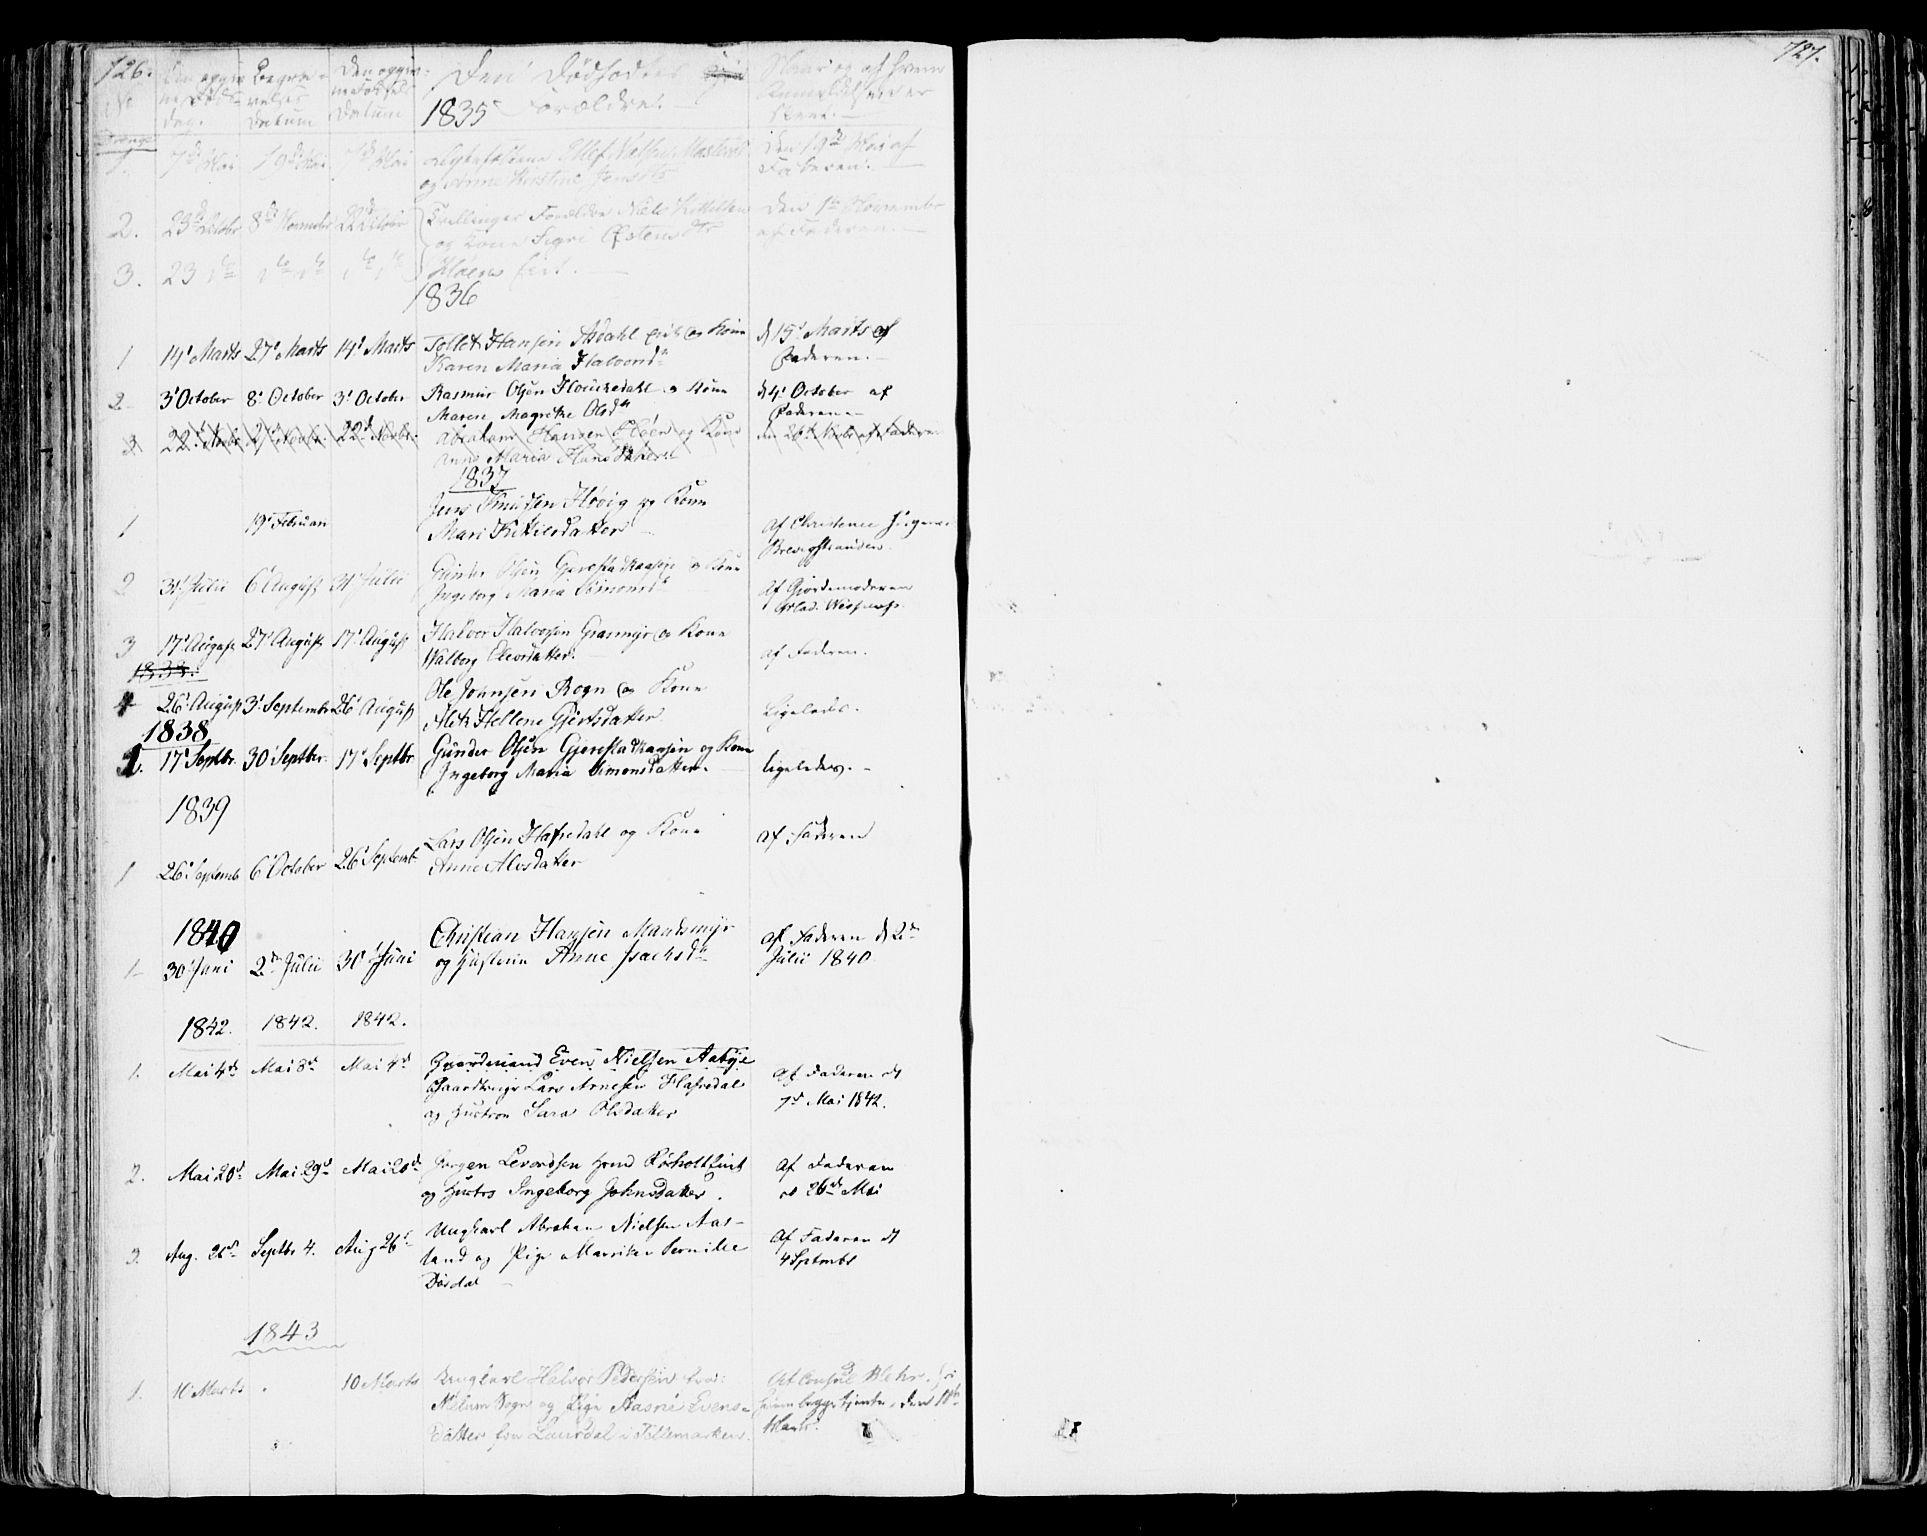 SAKO, Bamble kirkebøker, F/Fa/L0004: Ministerialbok nr. I 4, 1834-1853, s. 726-727